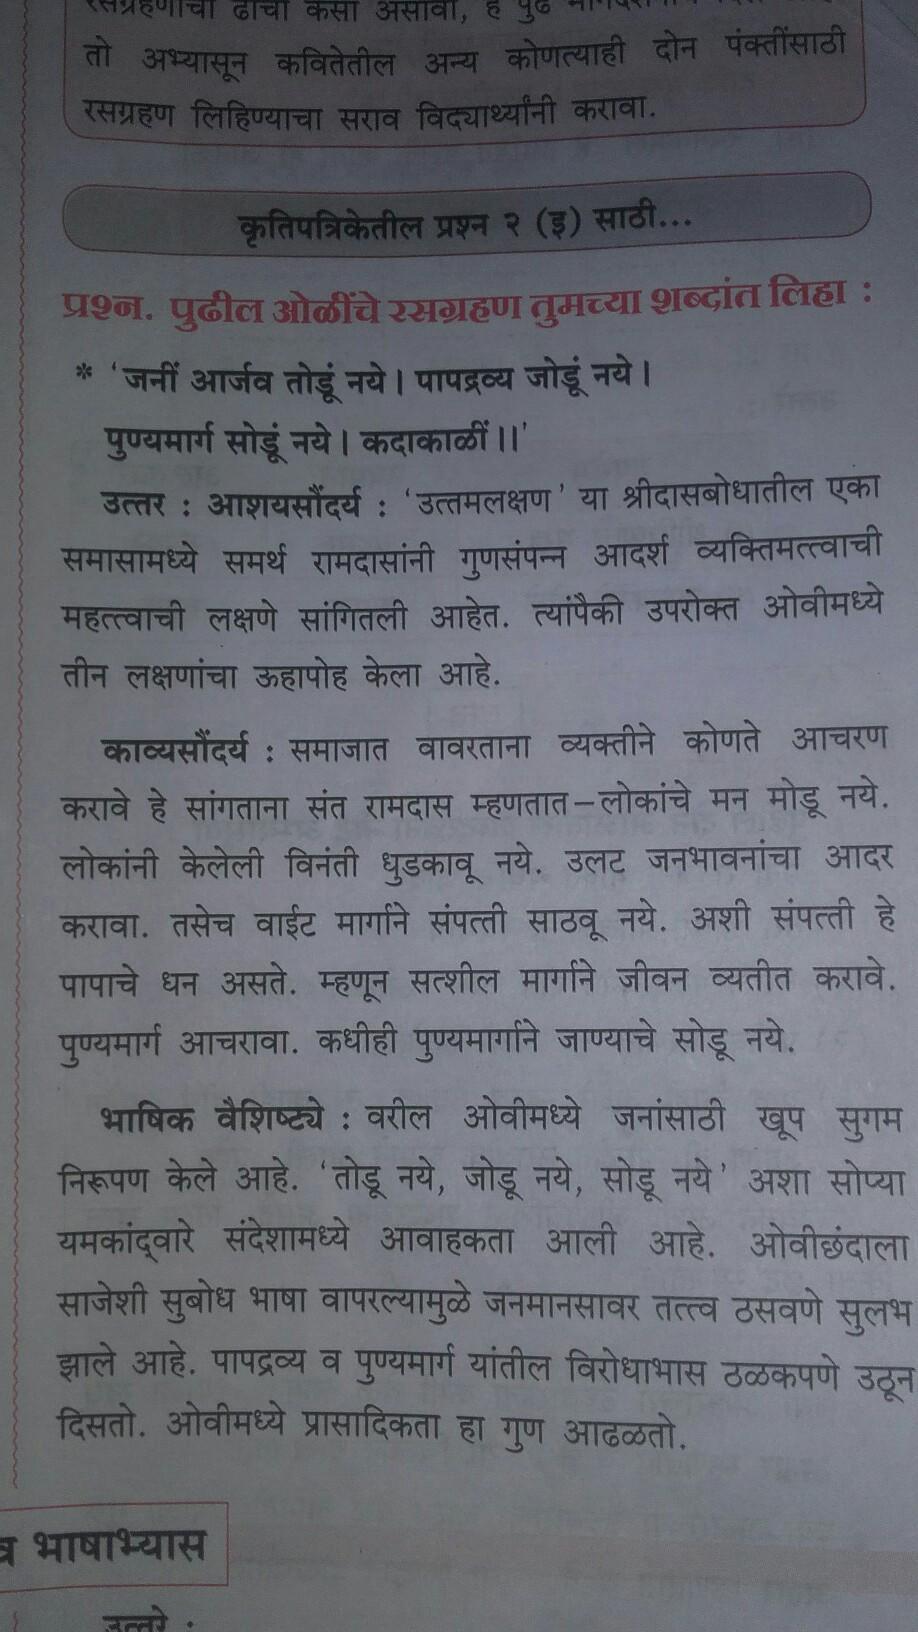 1st standard marathi poem